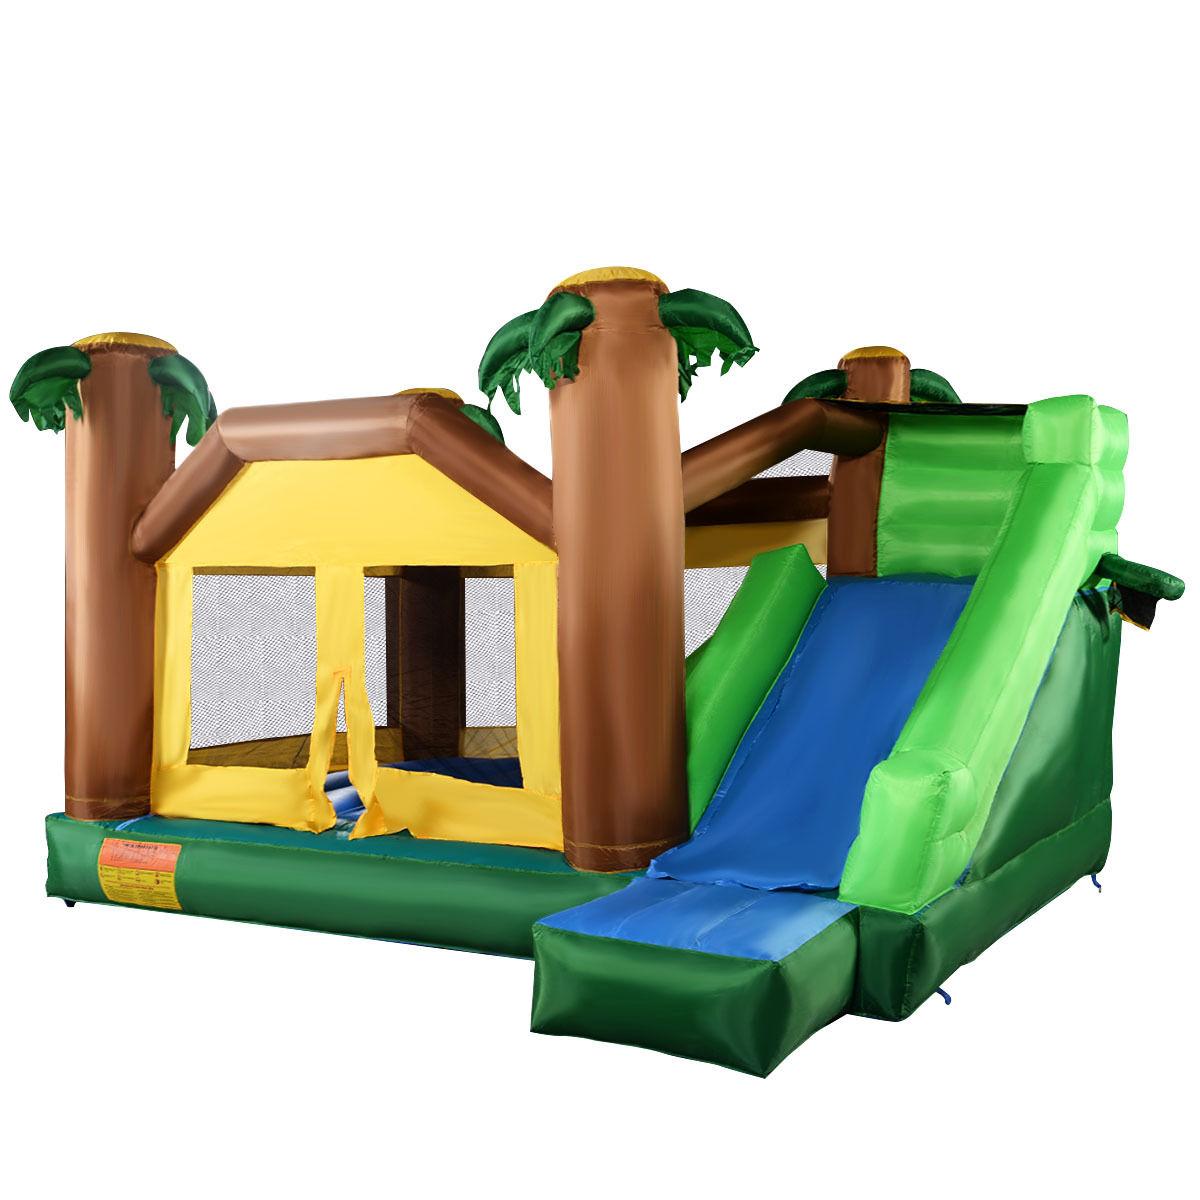 Costway Inflatable Moonwalk Jungle Bounce House Jumper Bo...